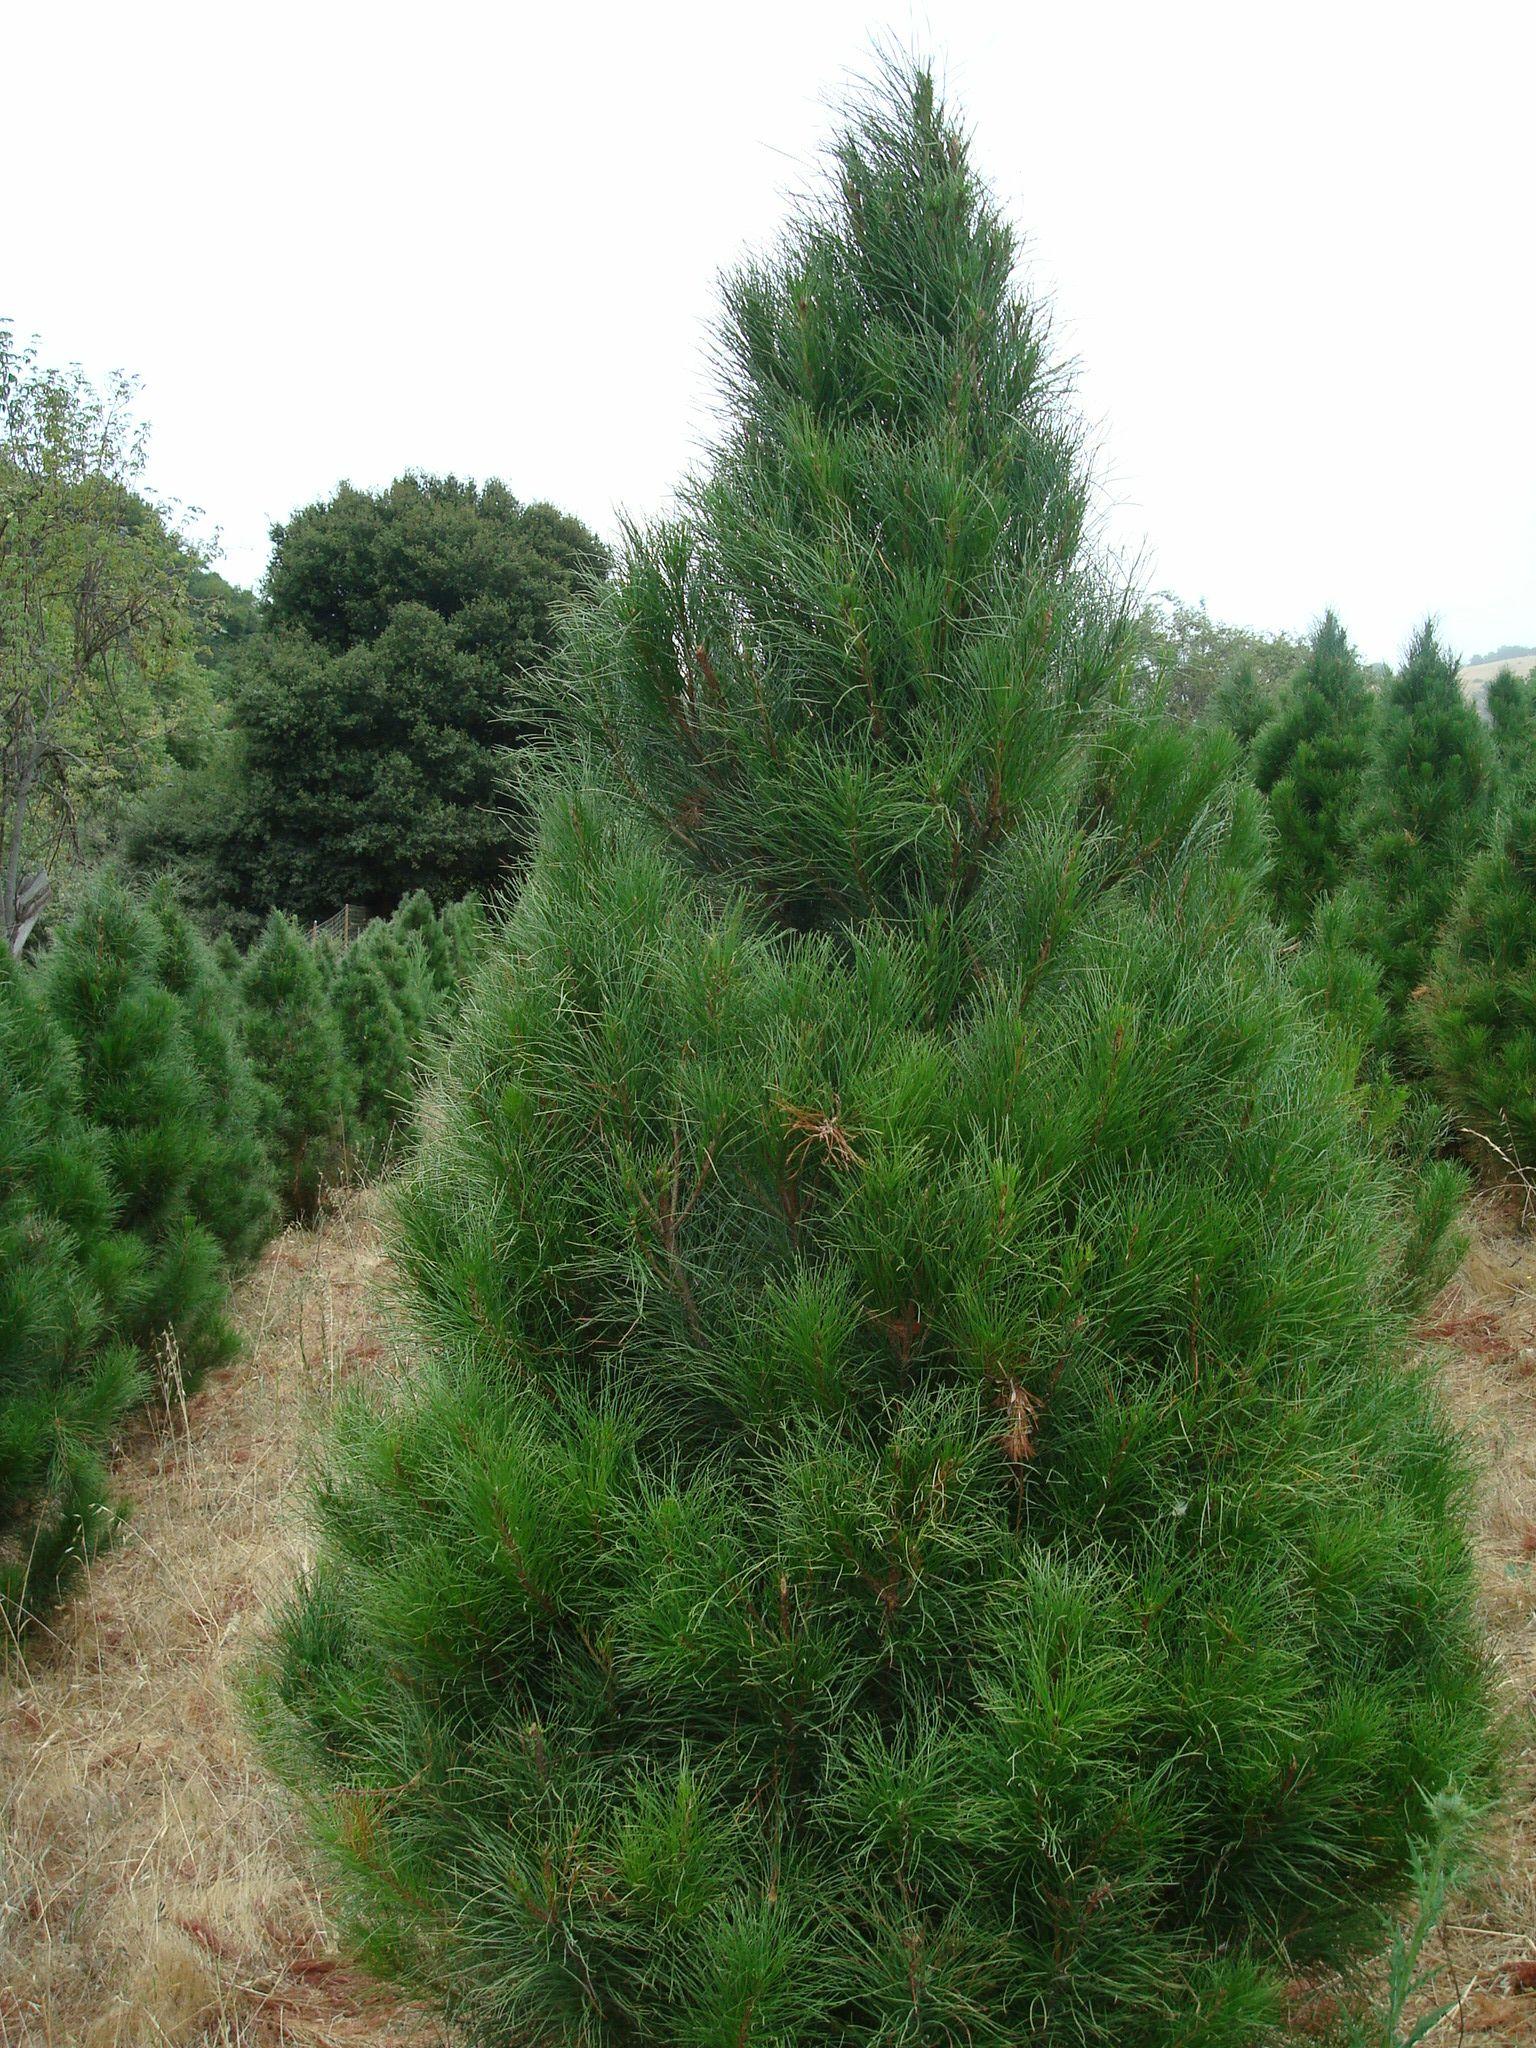 Sierra Redwood Tree Is A Fleecy Looking Tree With A